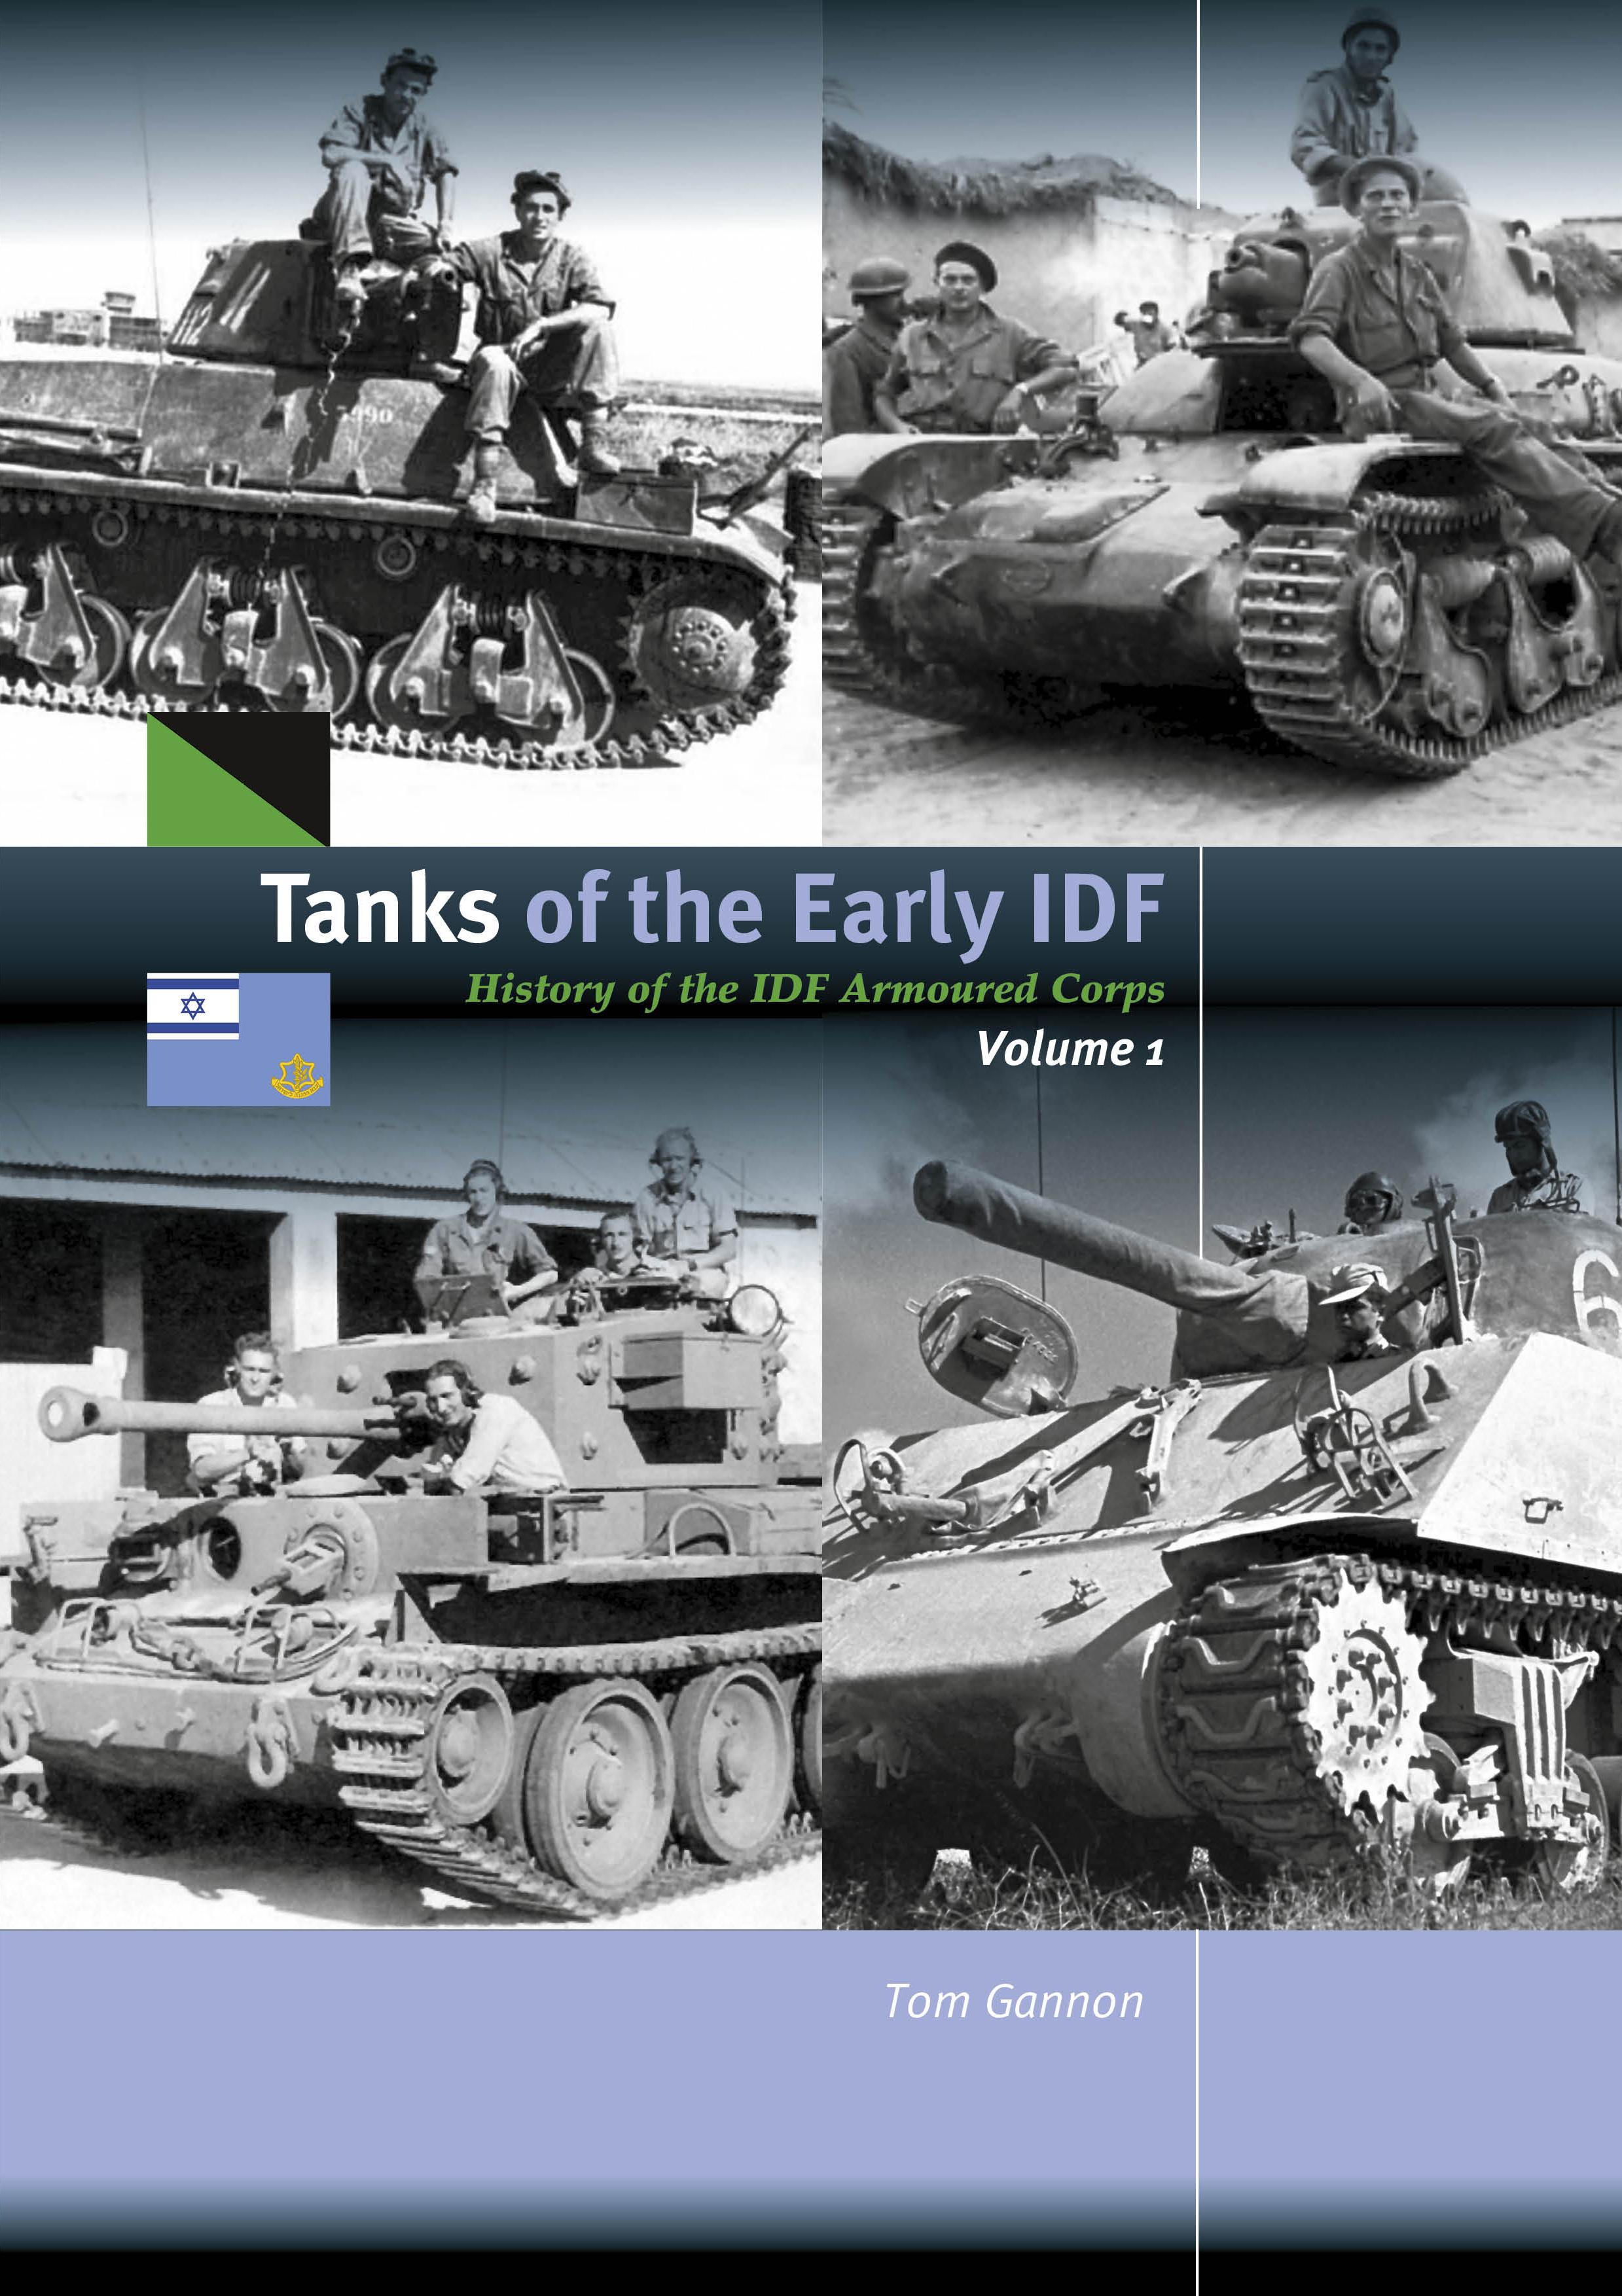 CVR_IDFEarlyTanks Vol1